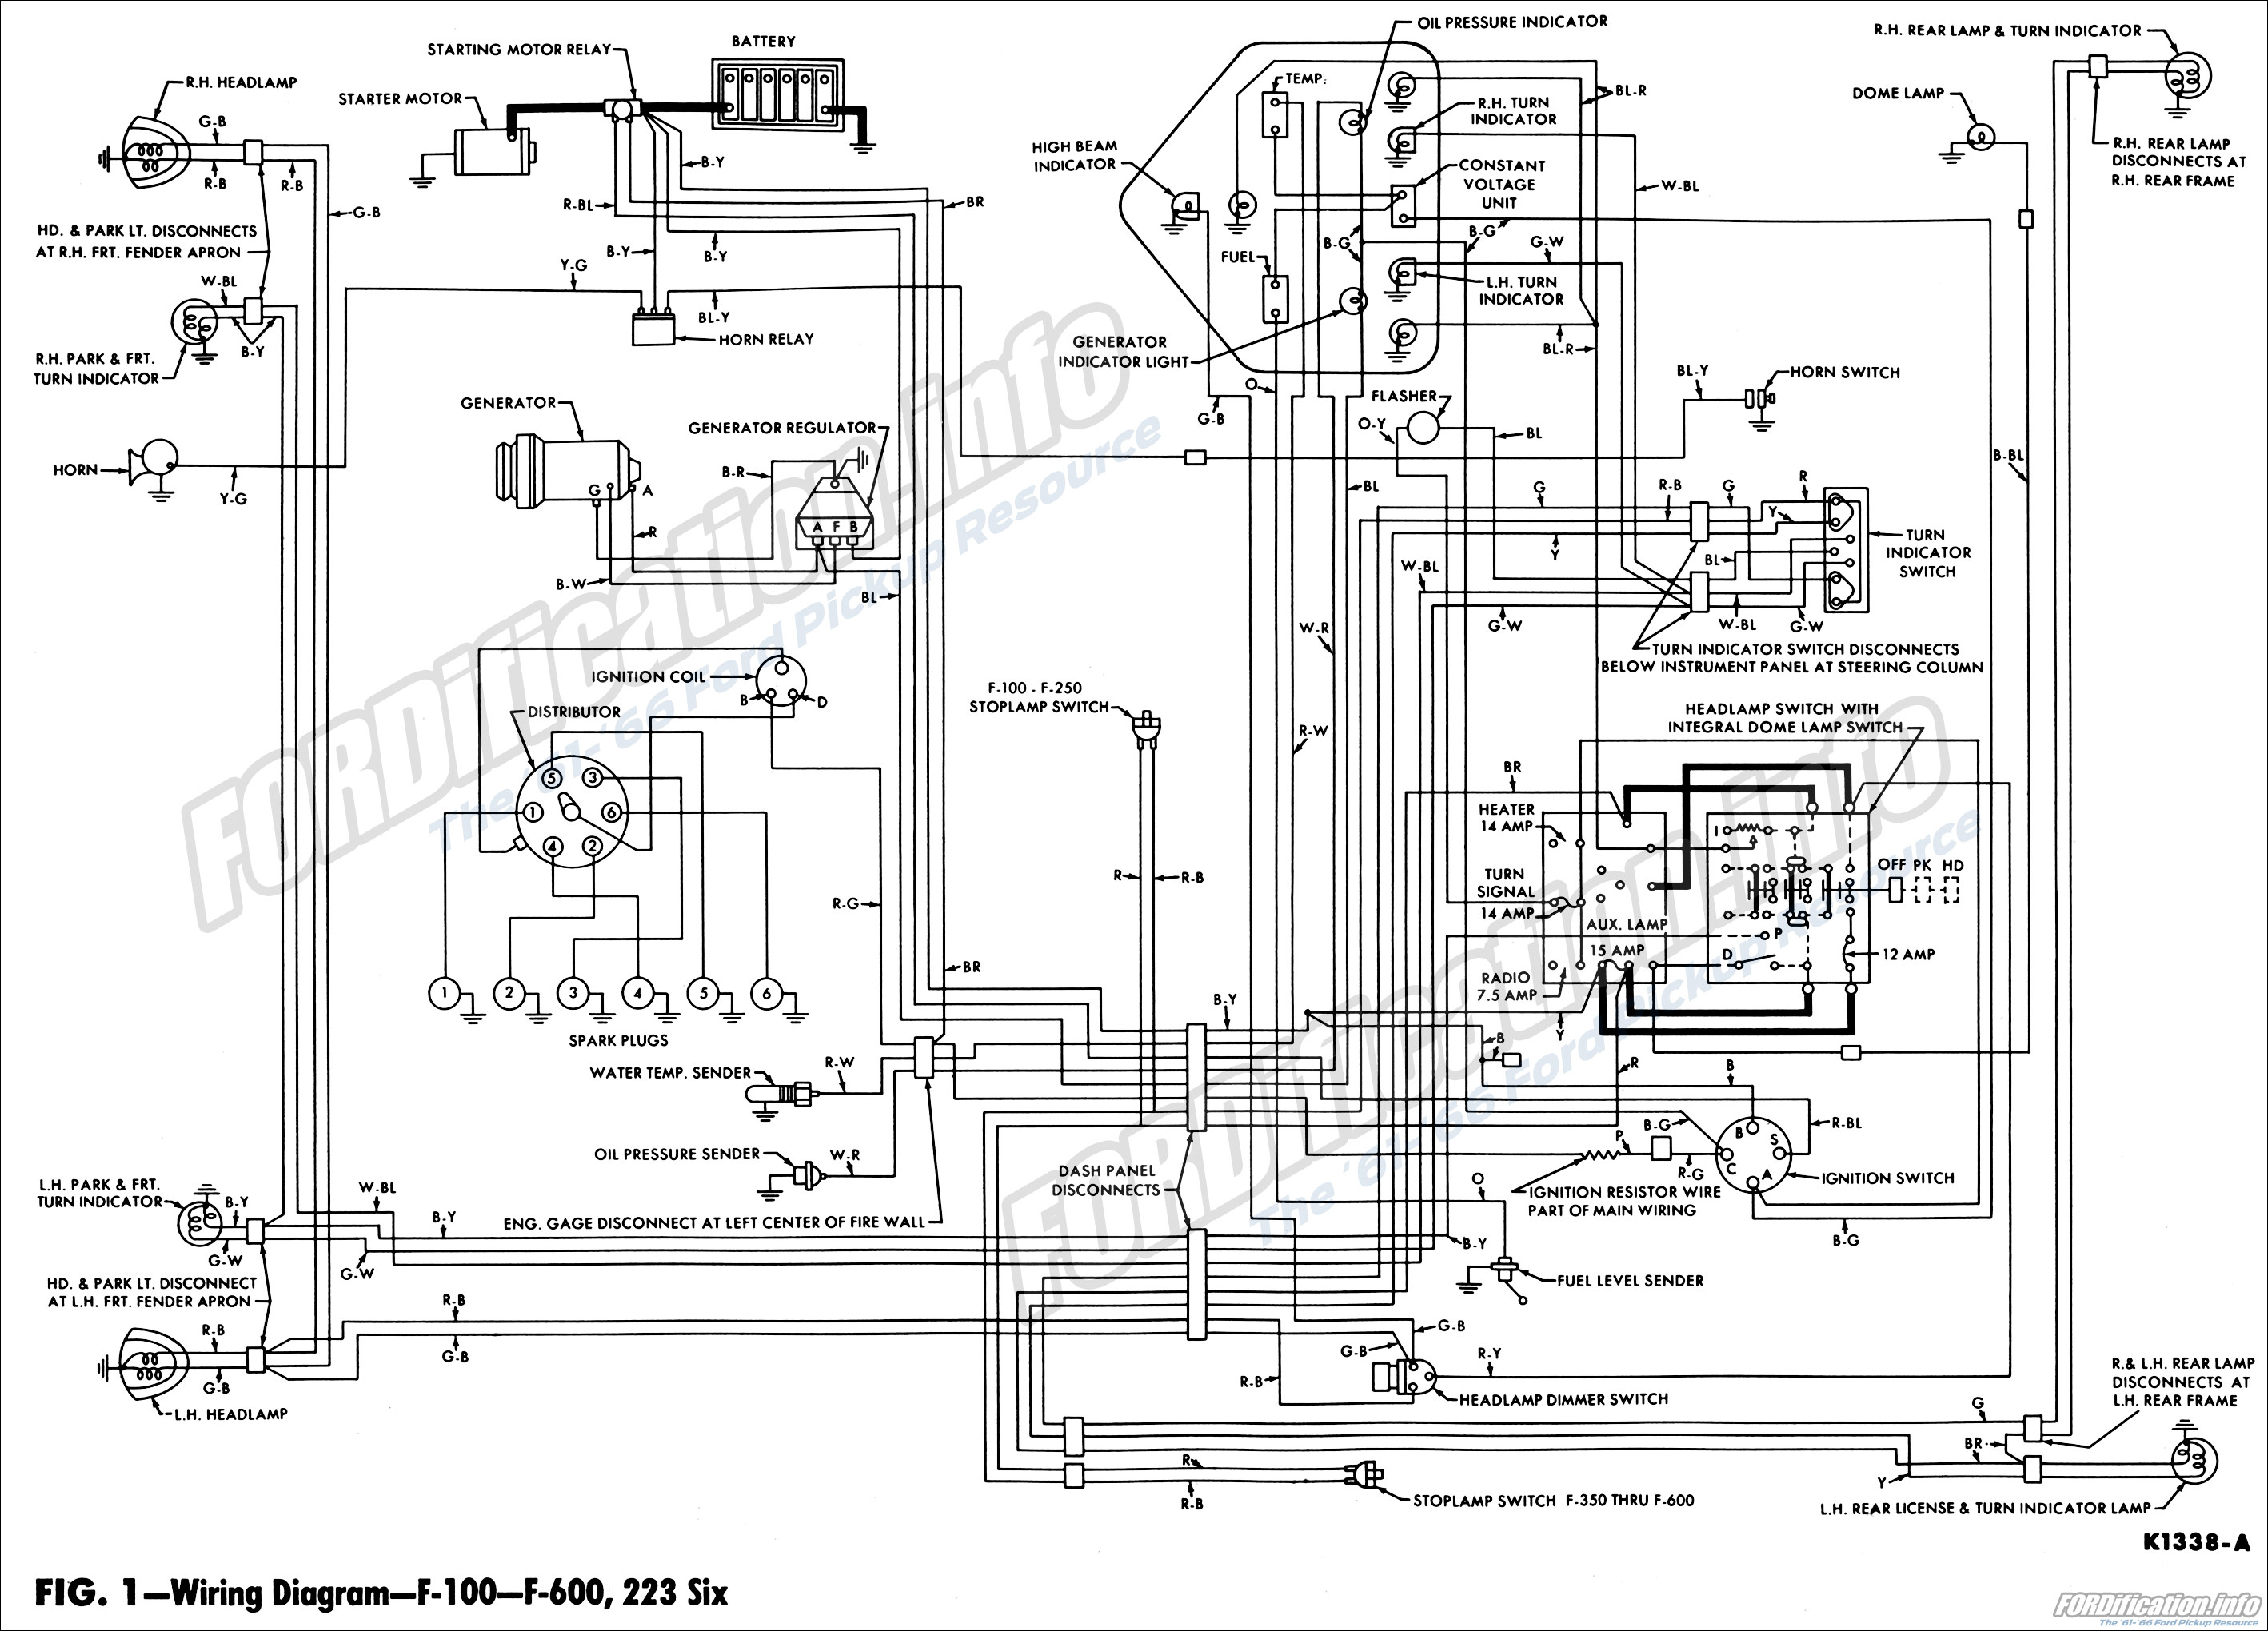 61 f100 wiring diagram